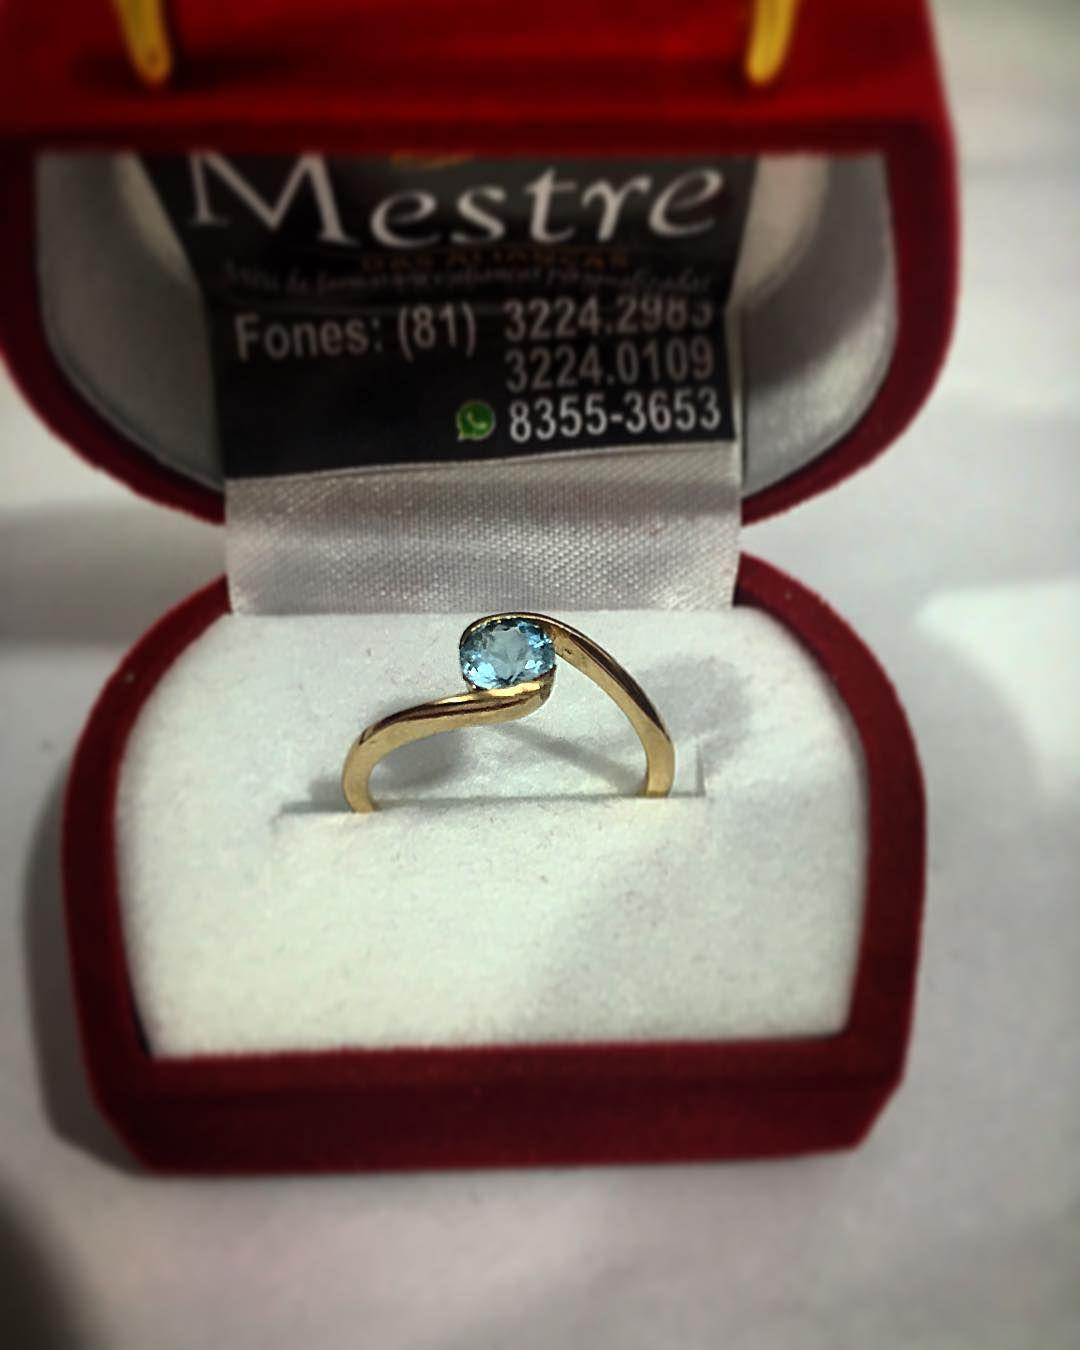 "ddfb824c099a5 Anel em ouro 18K. Pedra natural. Água marinha.""   Joias   Jewelry"